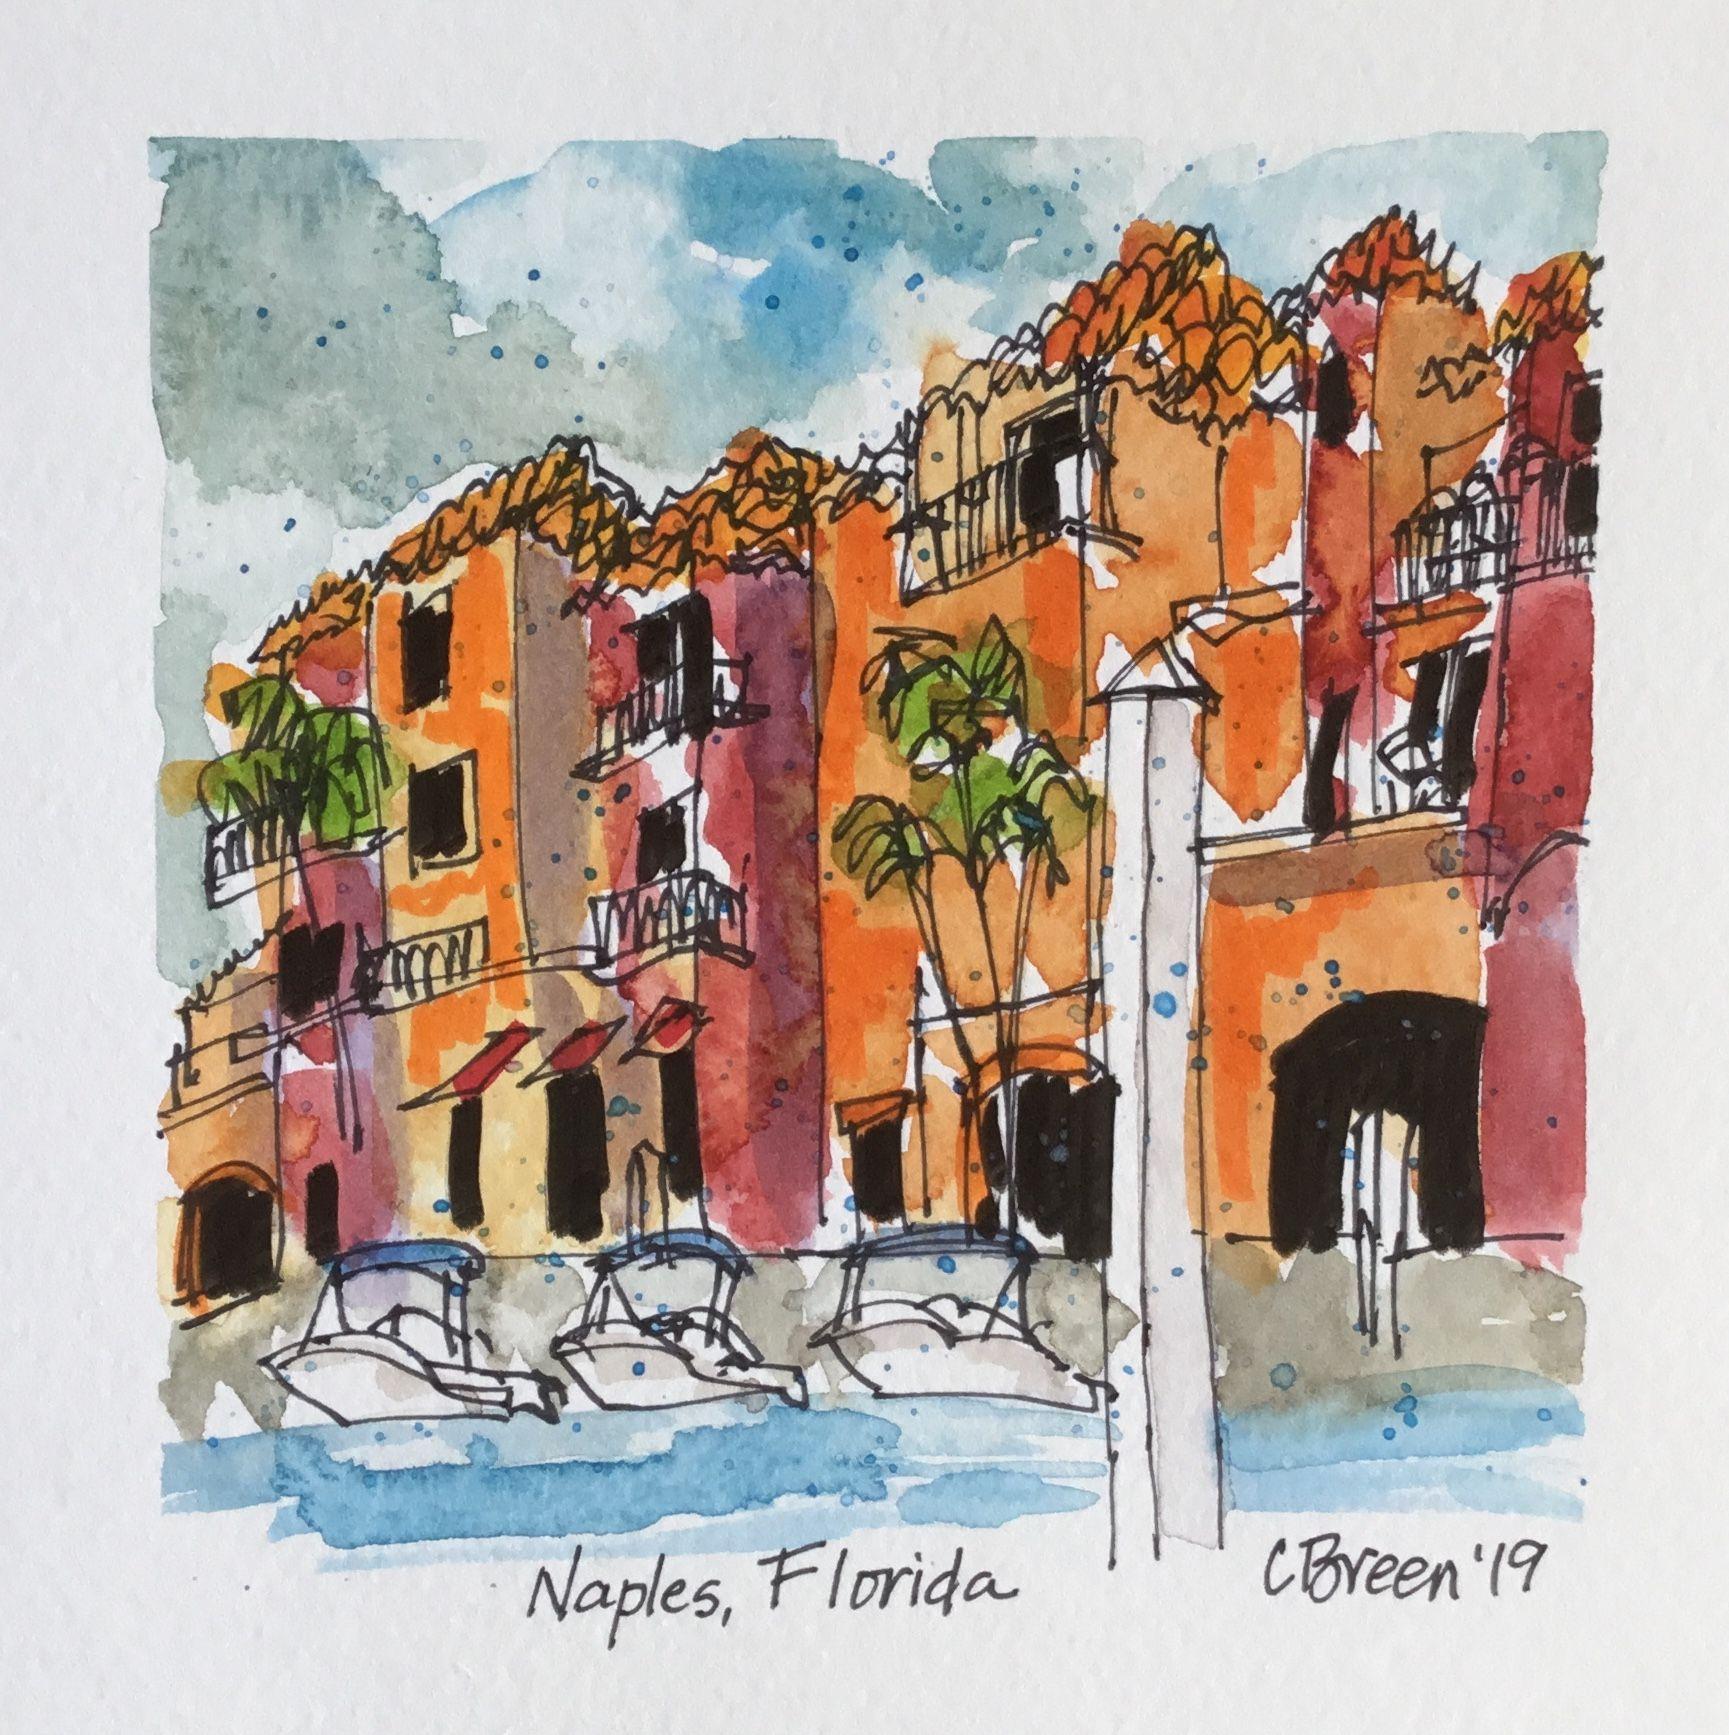 Naples Marina Florida C Breen 2019 Breenseven Urbansketch